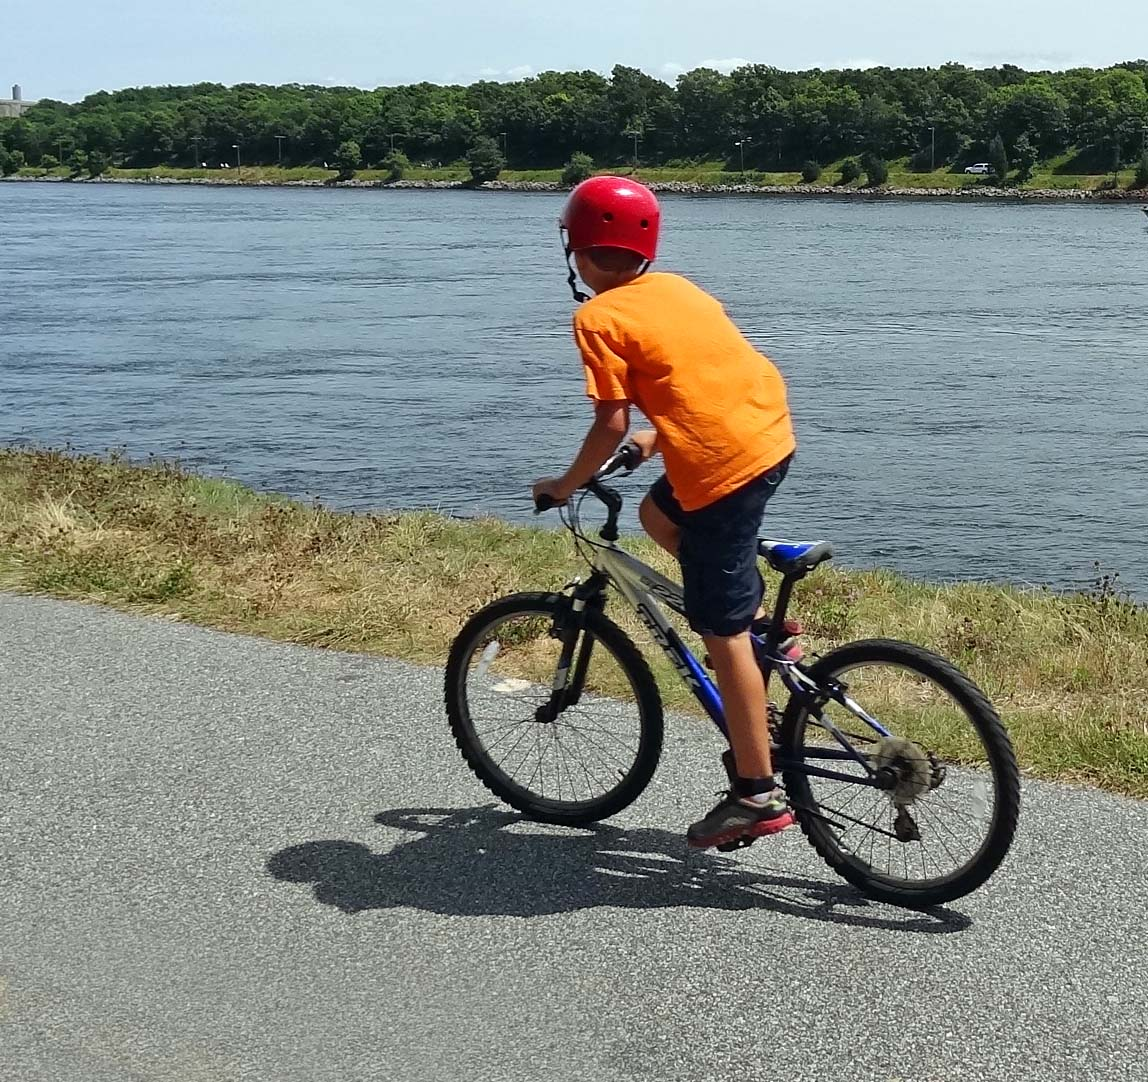 Kid On Bike Picture